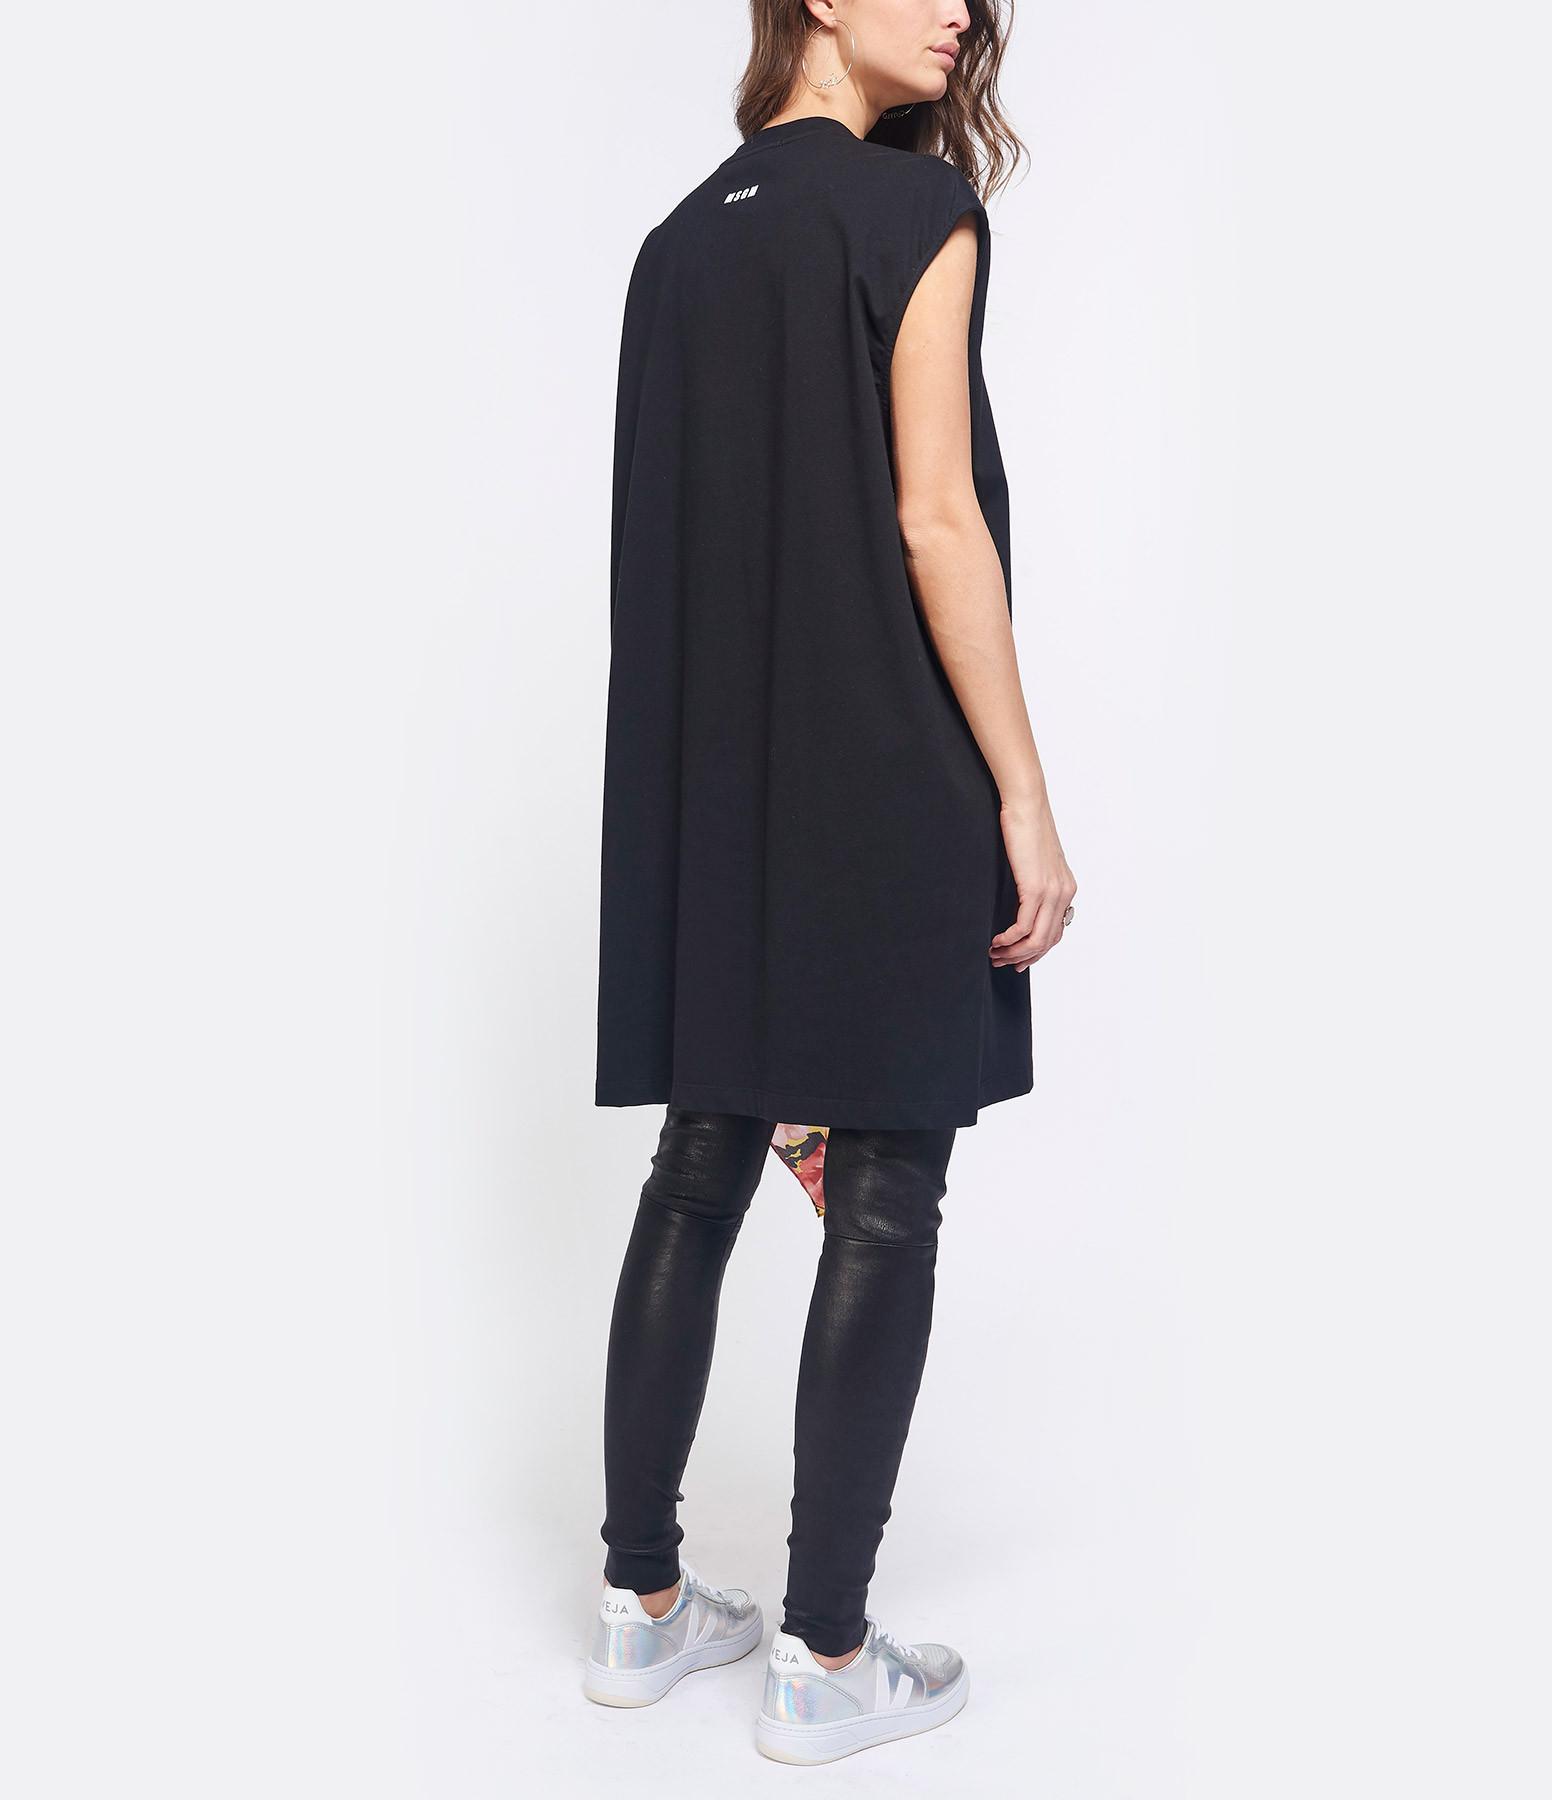 MSGM - Robe Tee-shirt Coton Noir